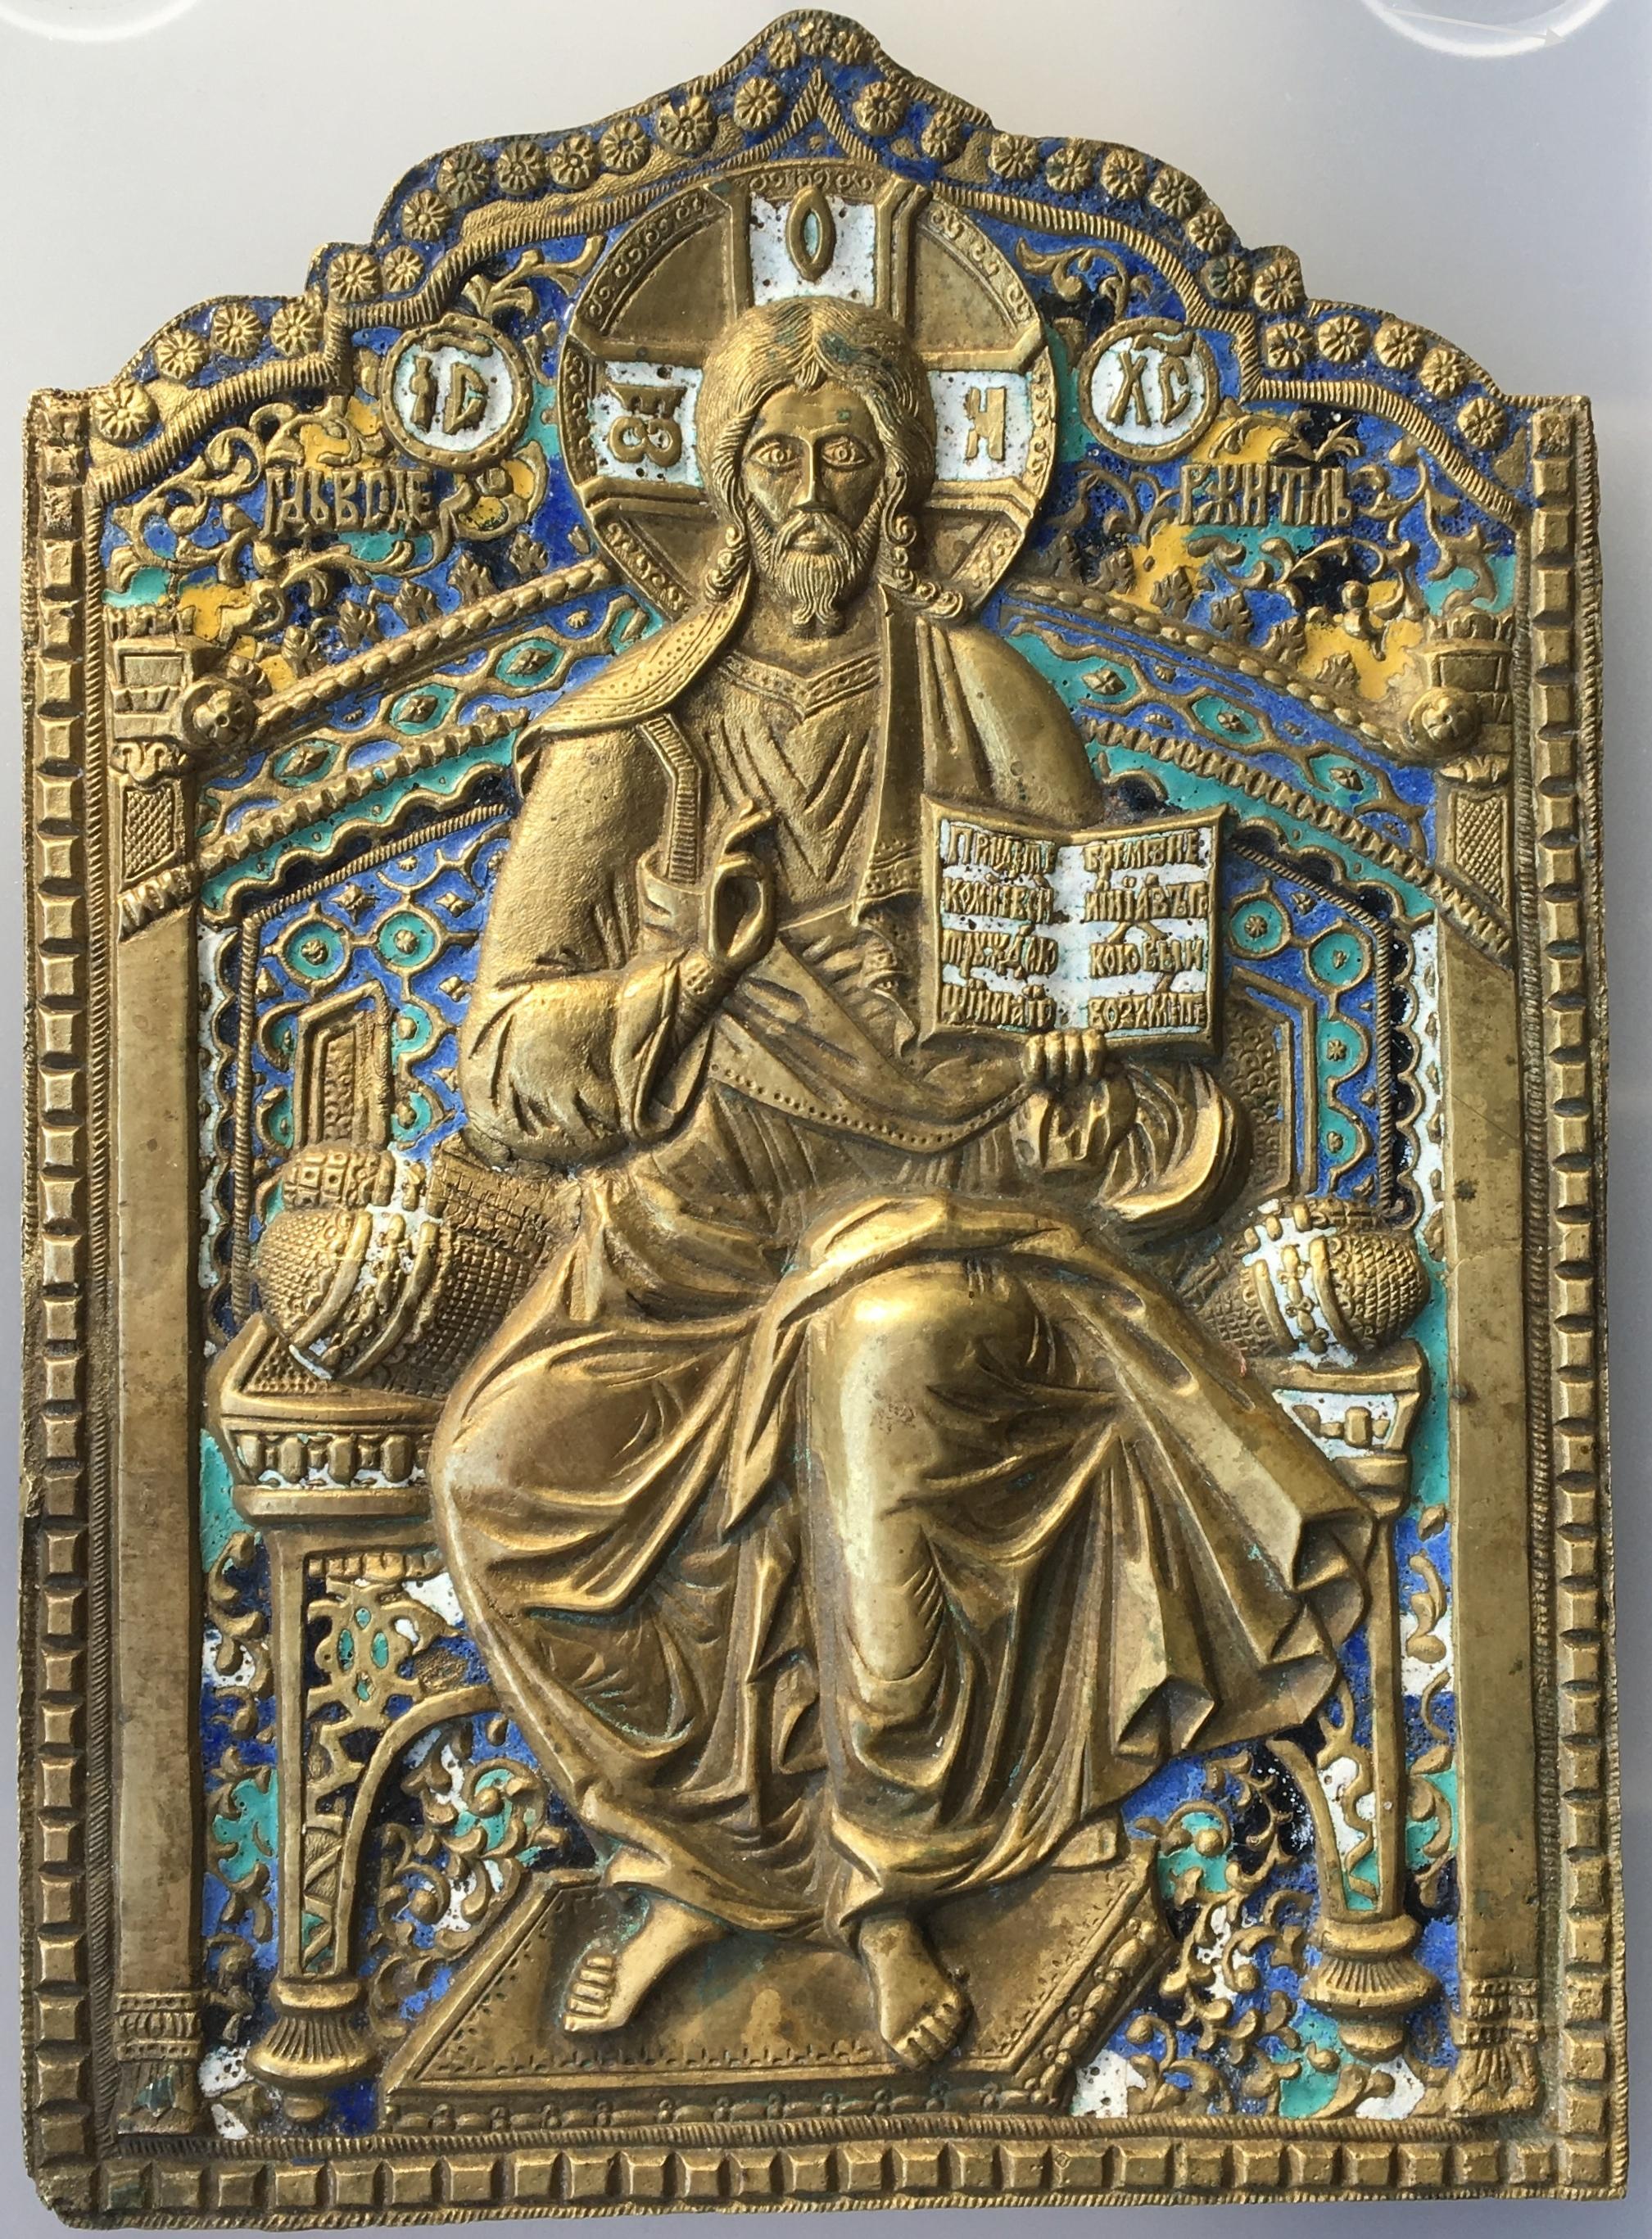 Икона Спас на престоле. Родион Хрусталев. 6 цв. Размер 22х16 см. Цена 250000 р.